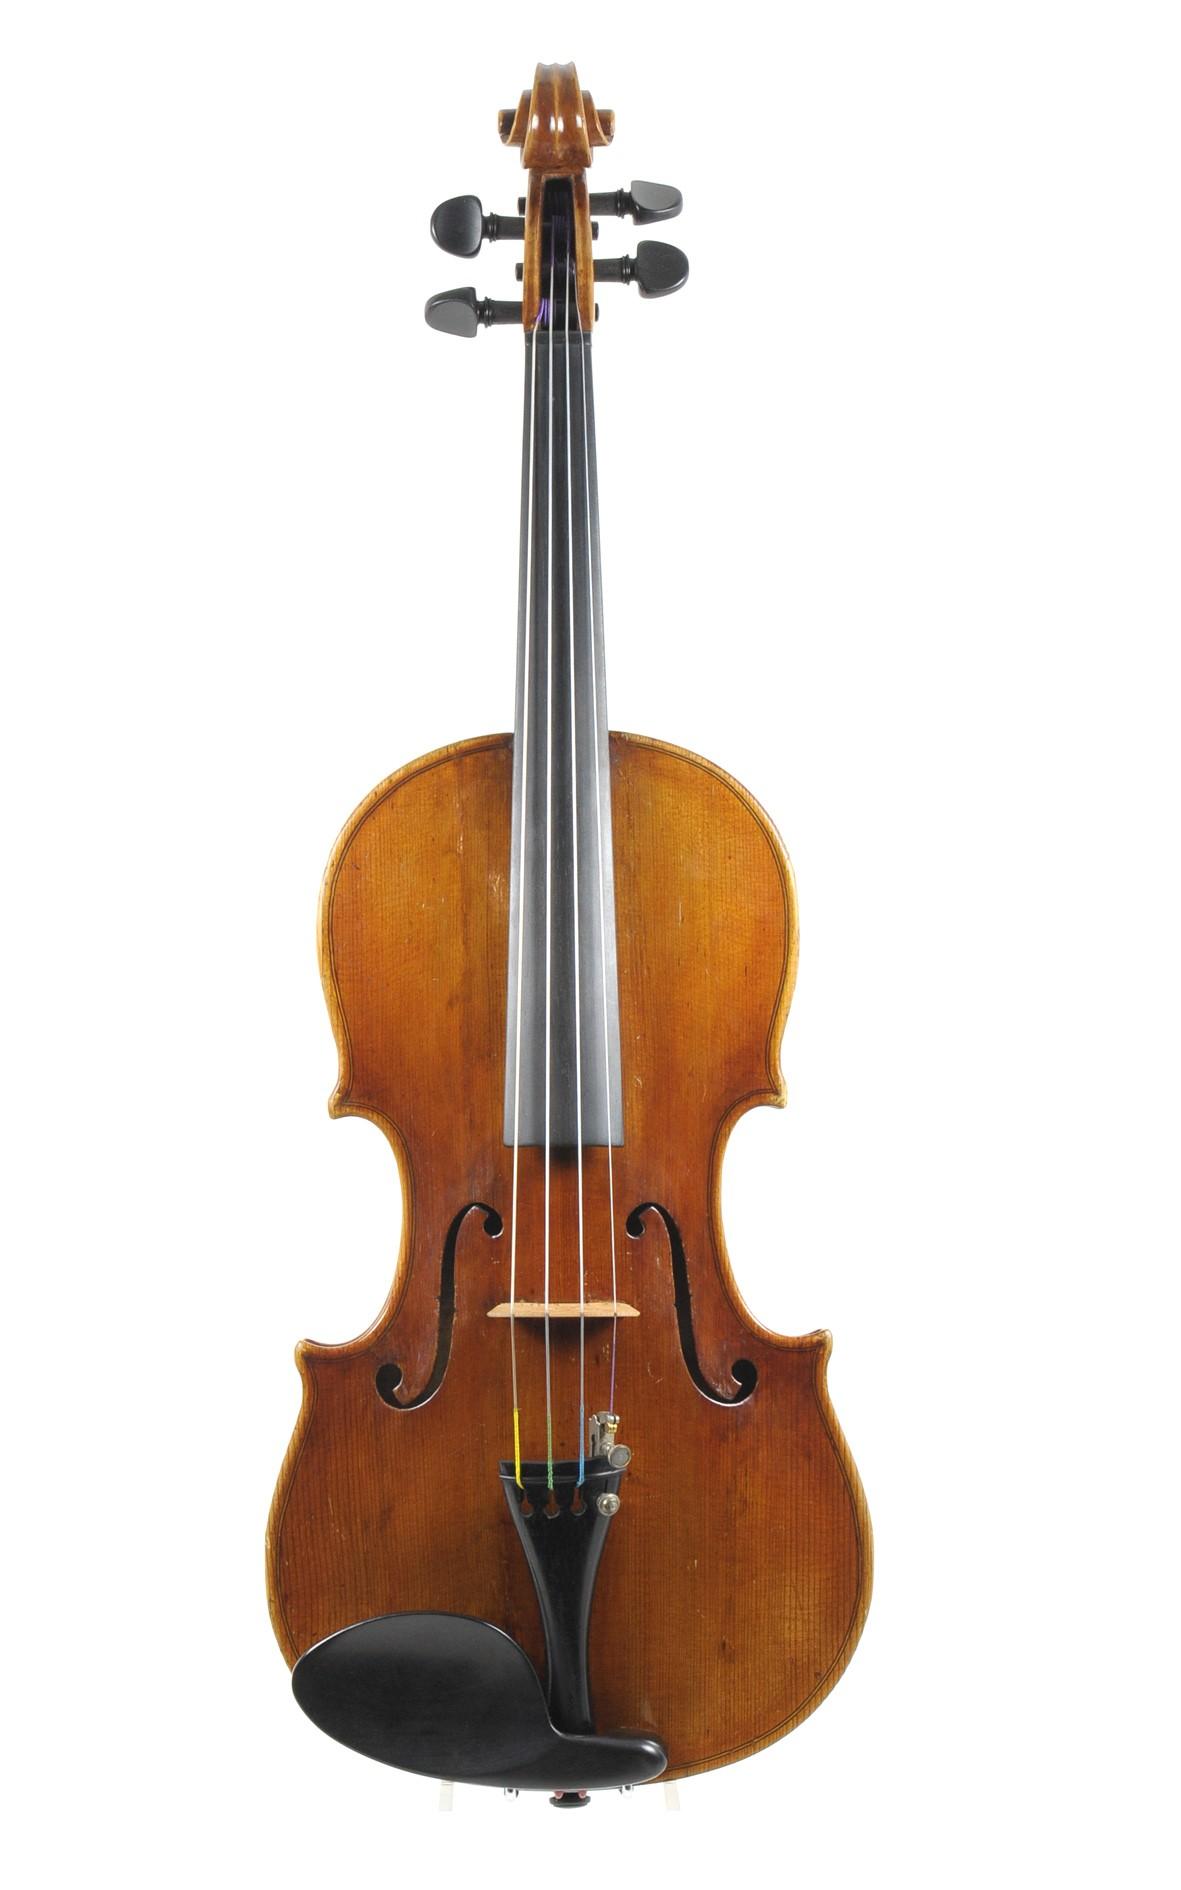 19th century Italian violin, Napes